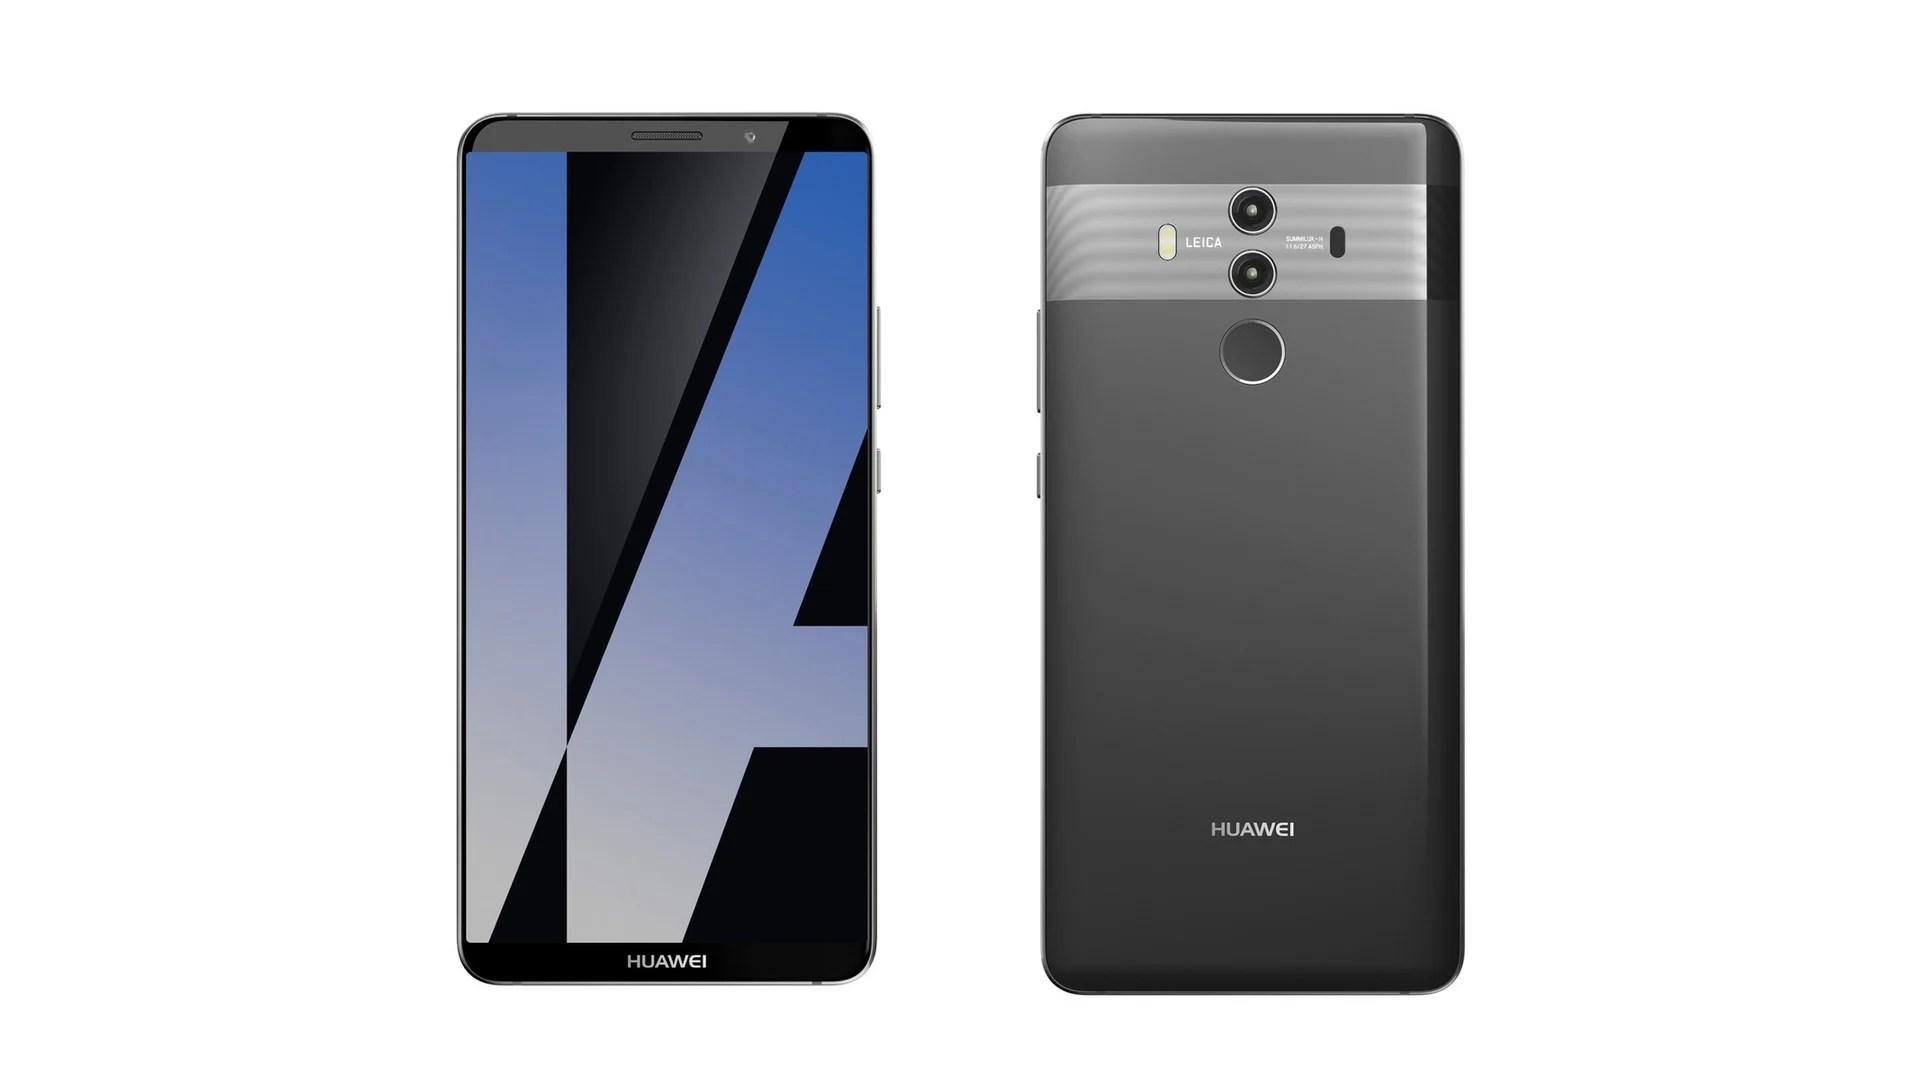 🔥 Bon plan : le Huawei Mate 10 Pro passe sous la barre des 500 euros